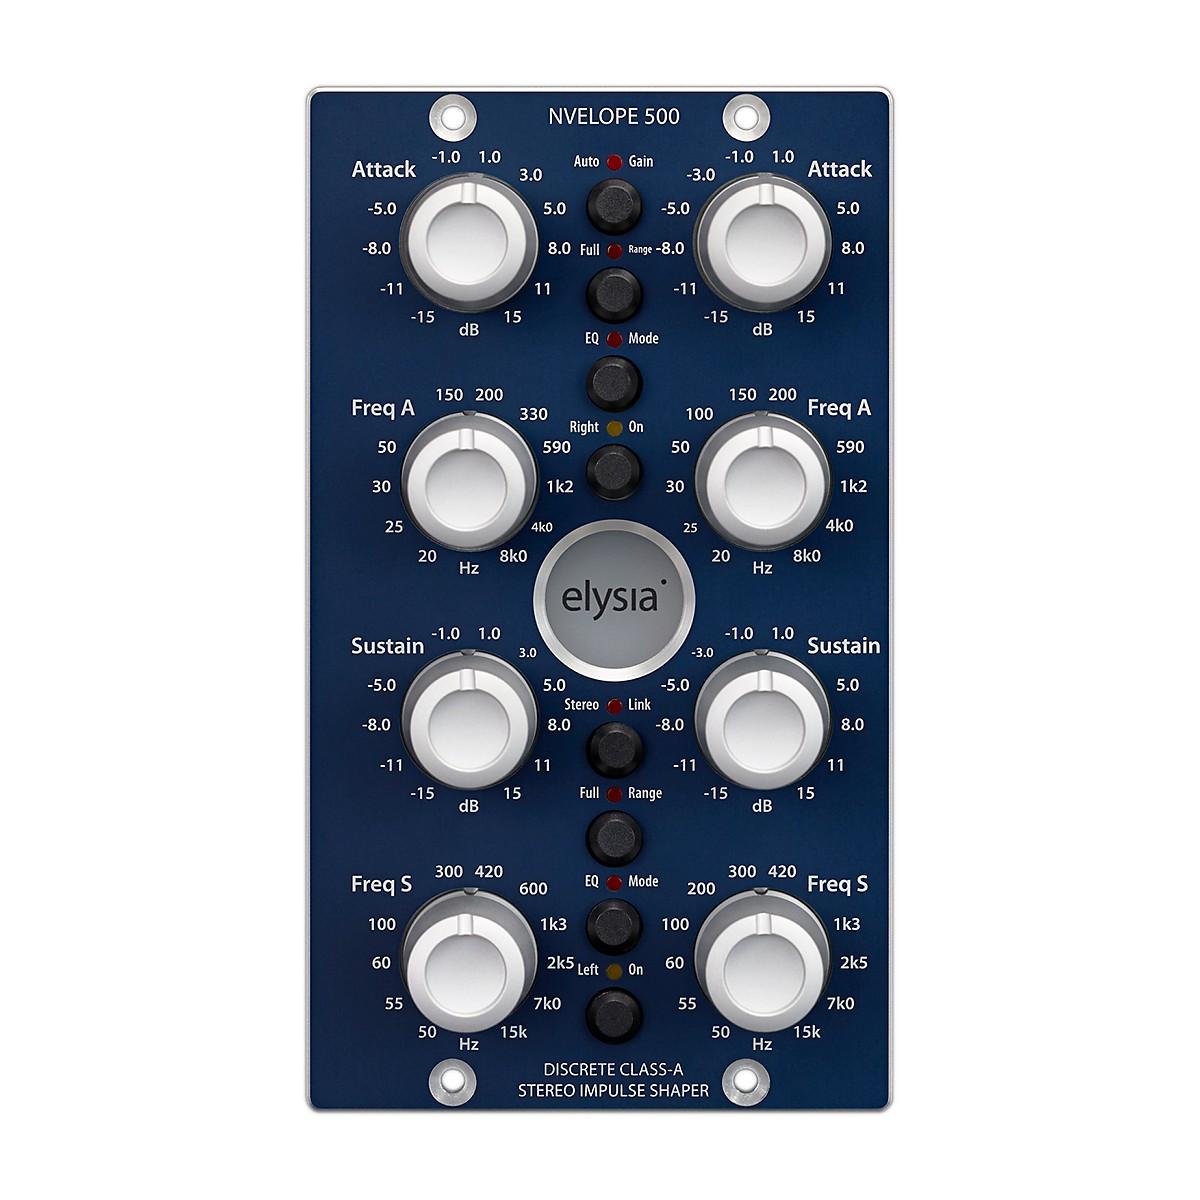 Elysia Nvelope 500 Series Stereo Impulse Shaper with Dual EQ Capabilities